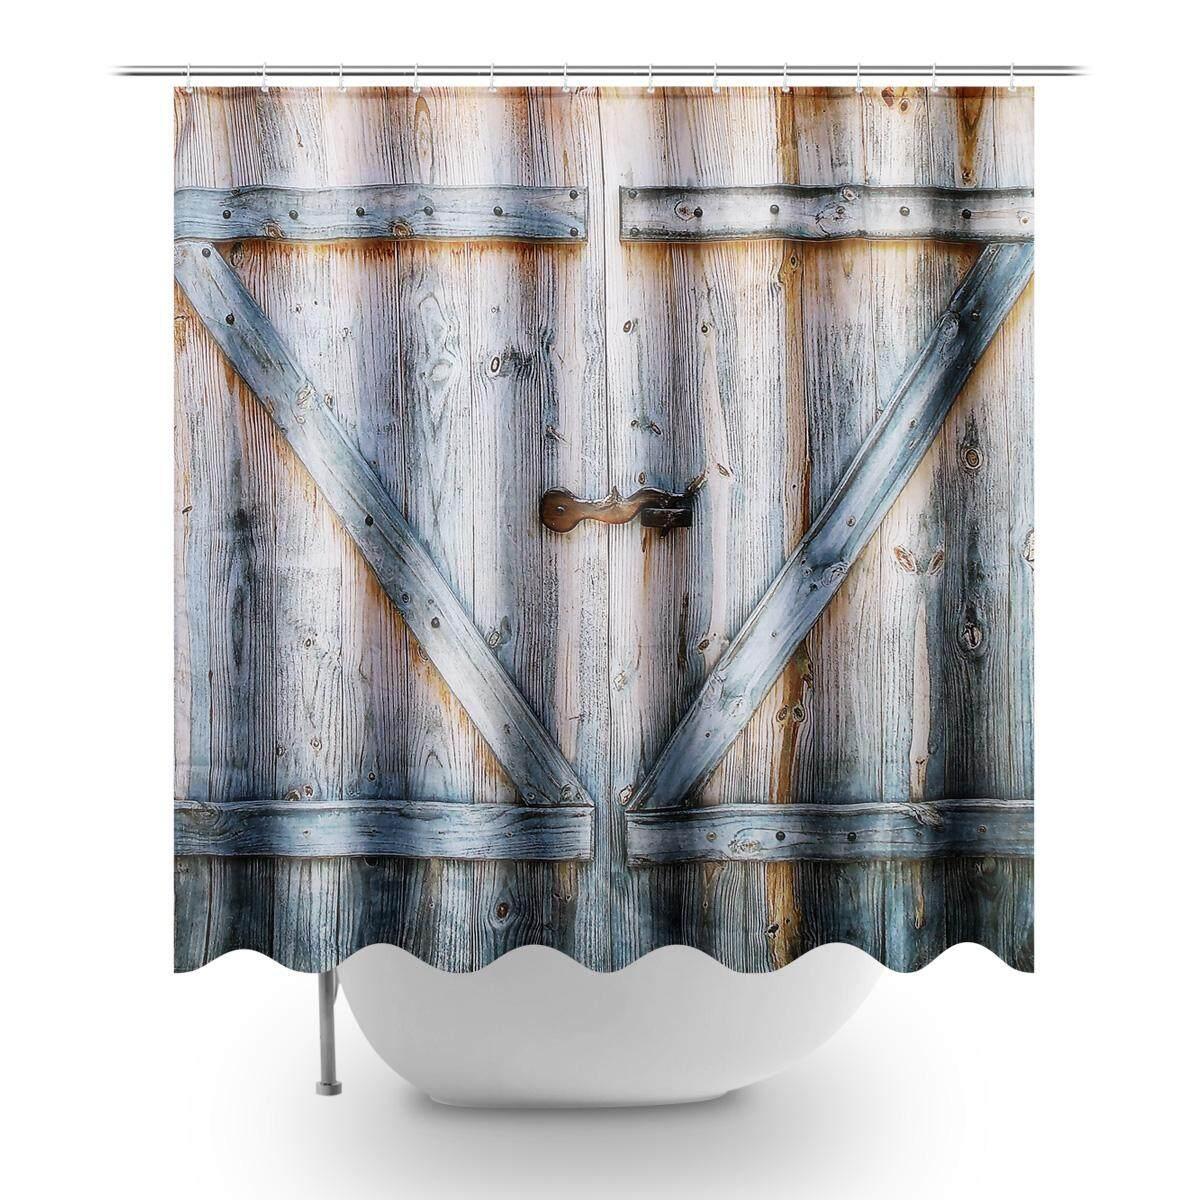 180 180cm Wooden Door 3d Printing Waterproof Shower Bath Curtain Hooks